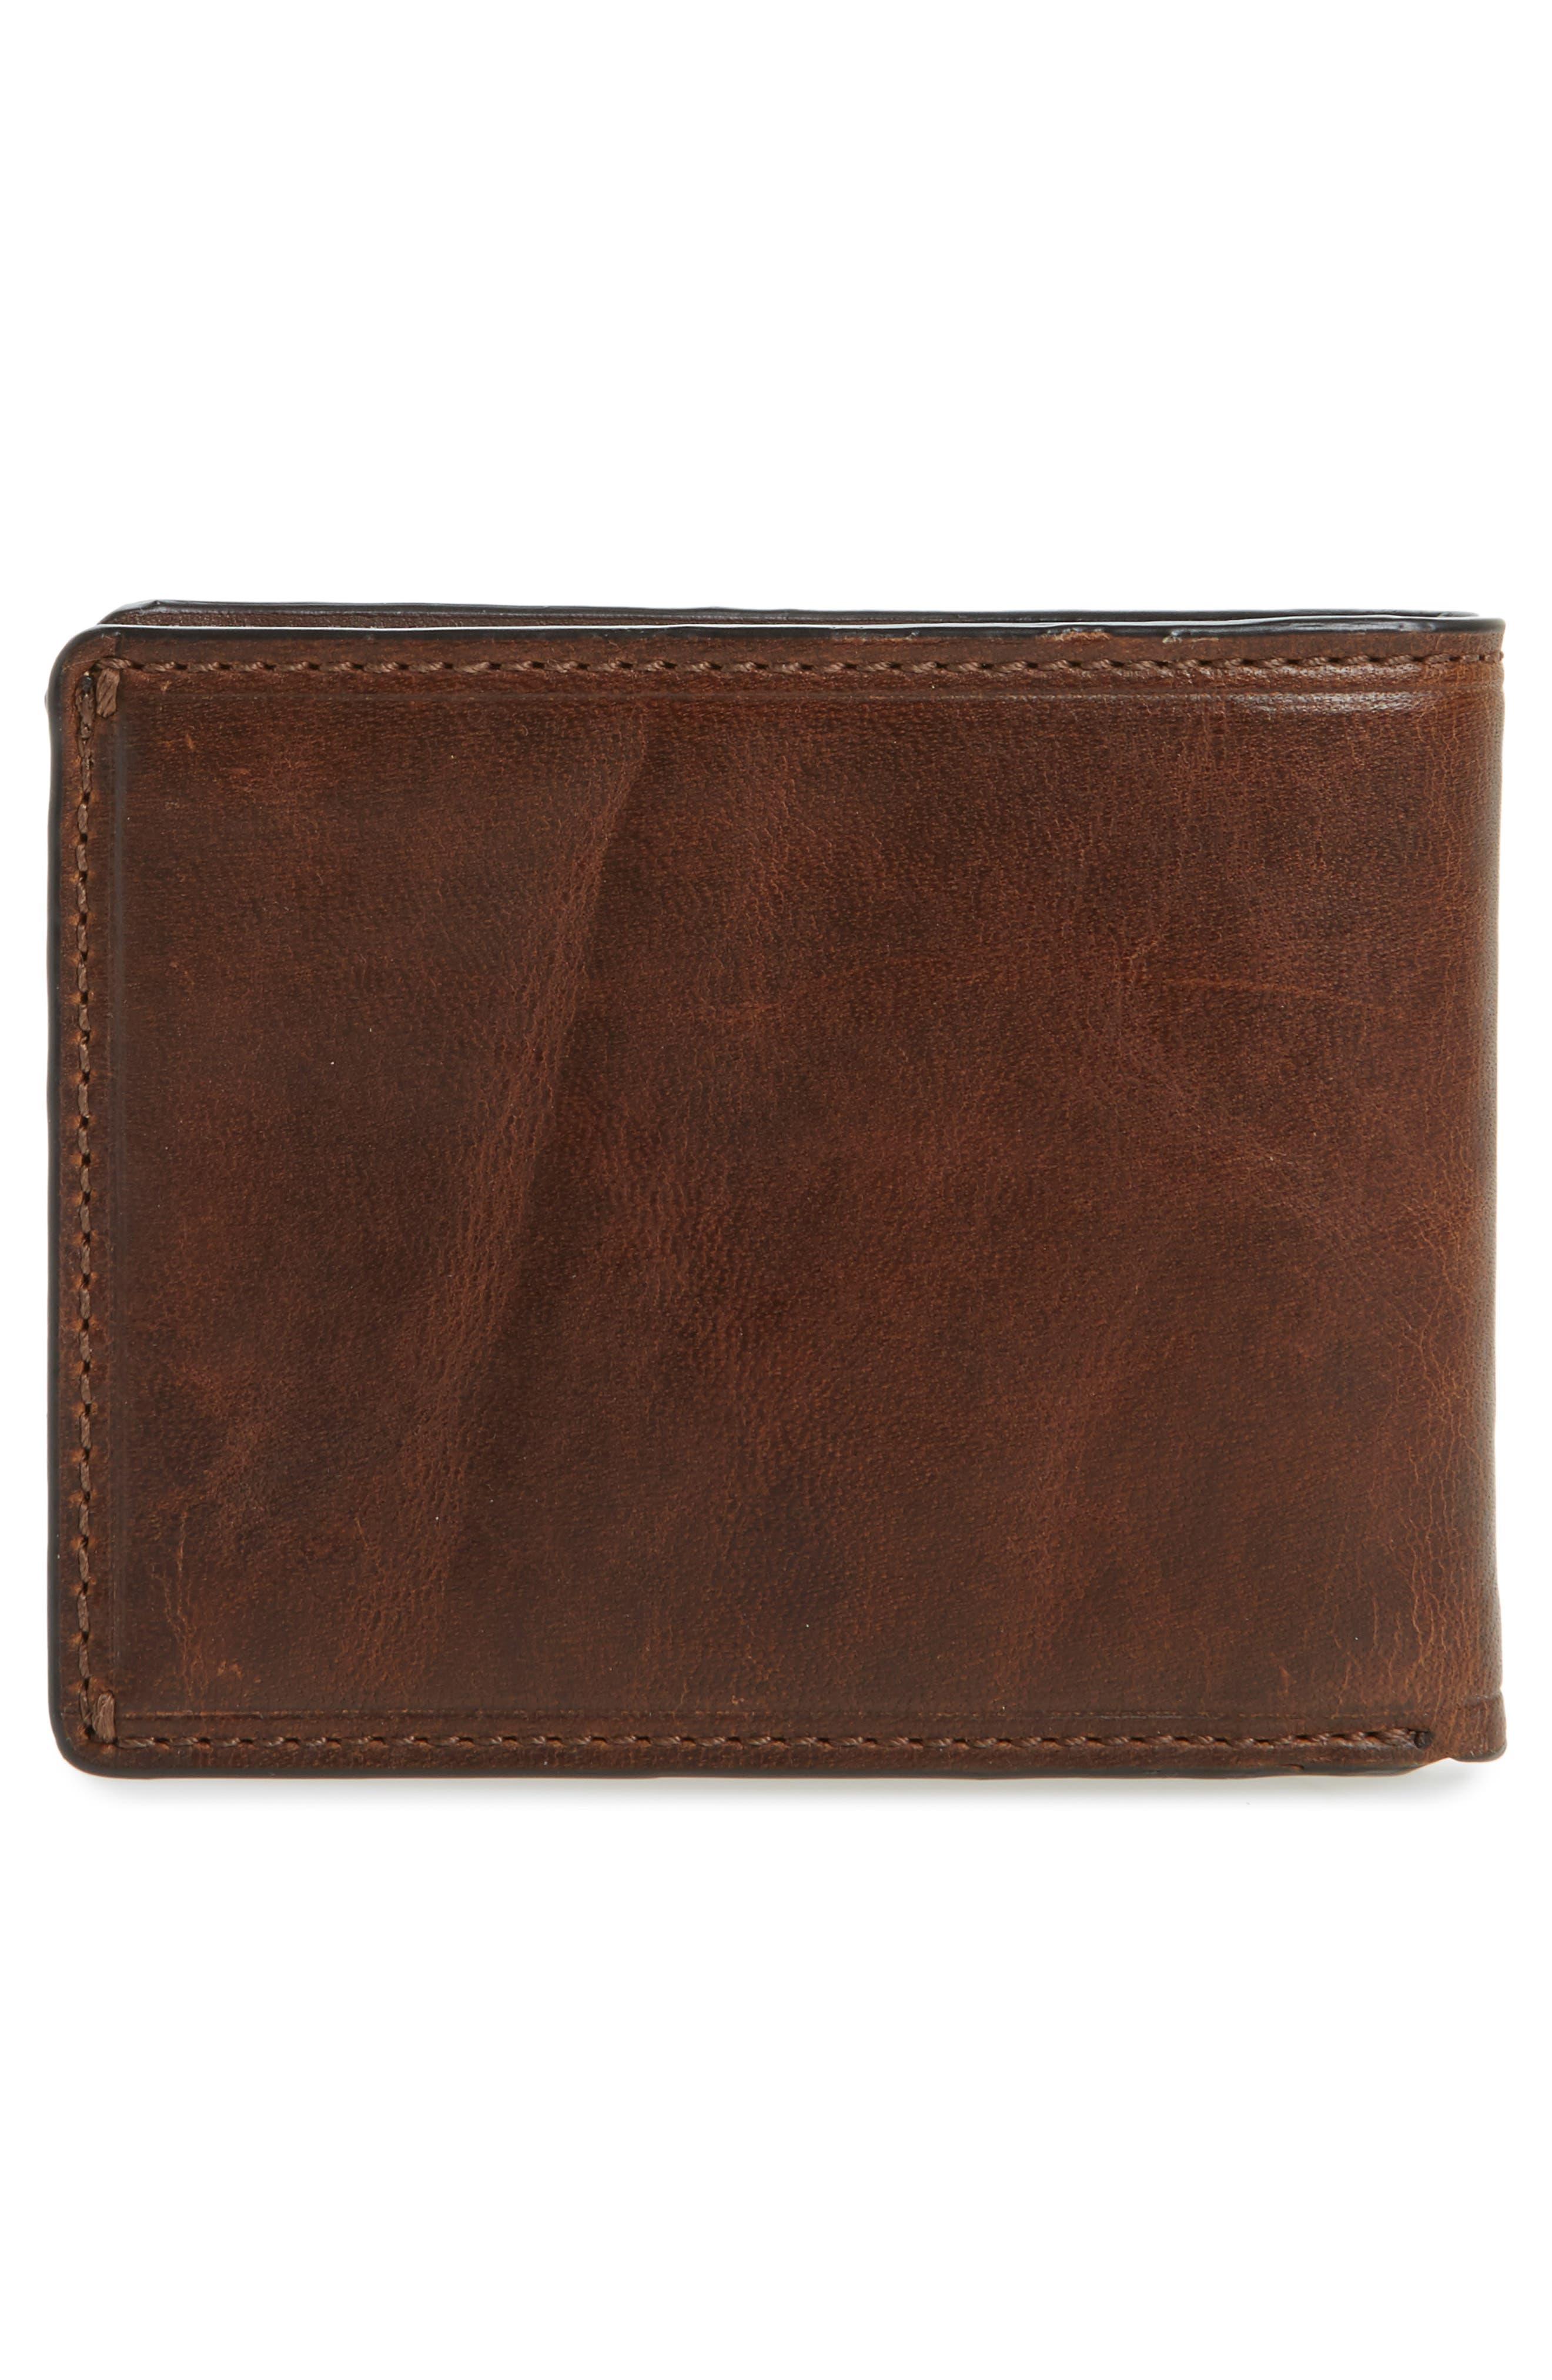 Logan Leather Wallet,                             Alternate thumbnail 3, color,                             DARK BROWN